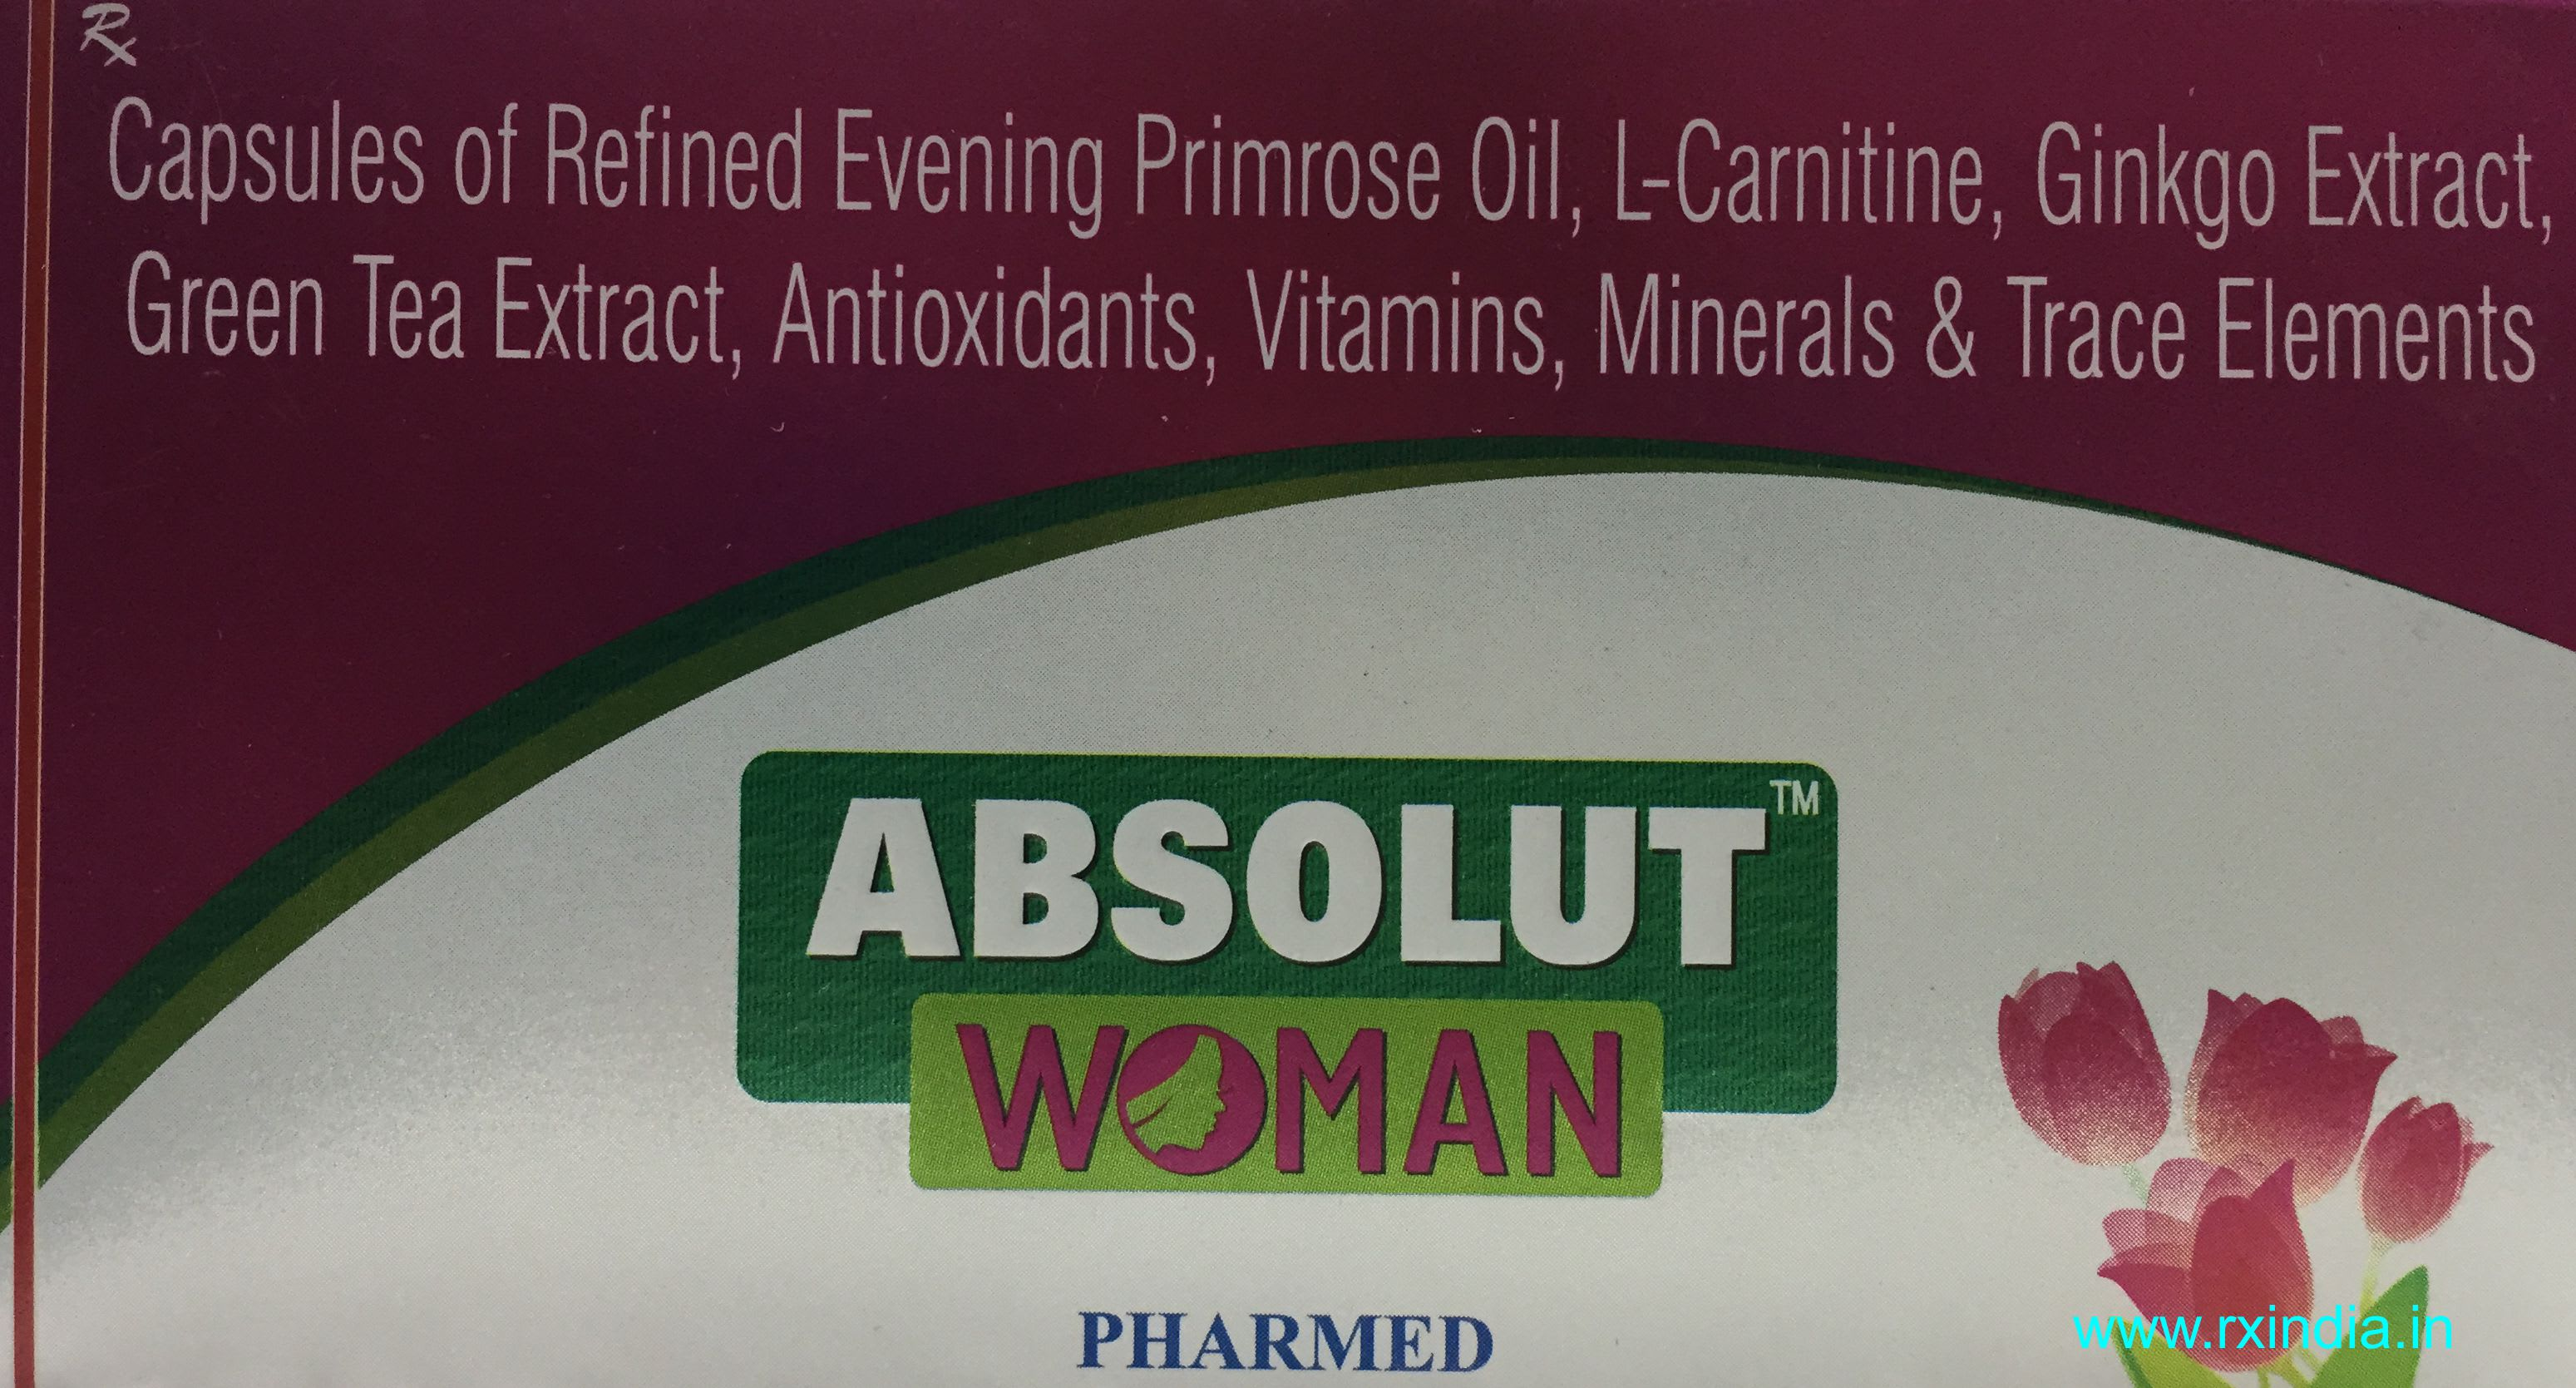 Absolut Woman Capsule